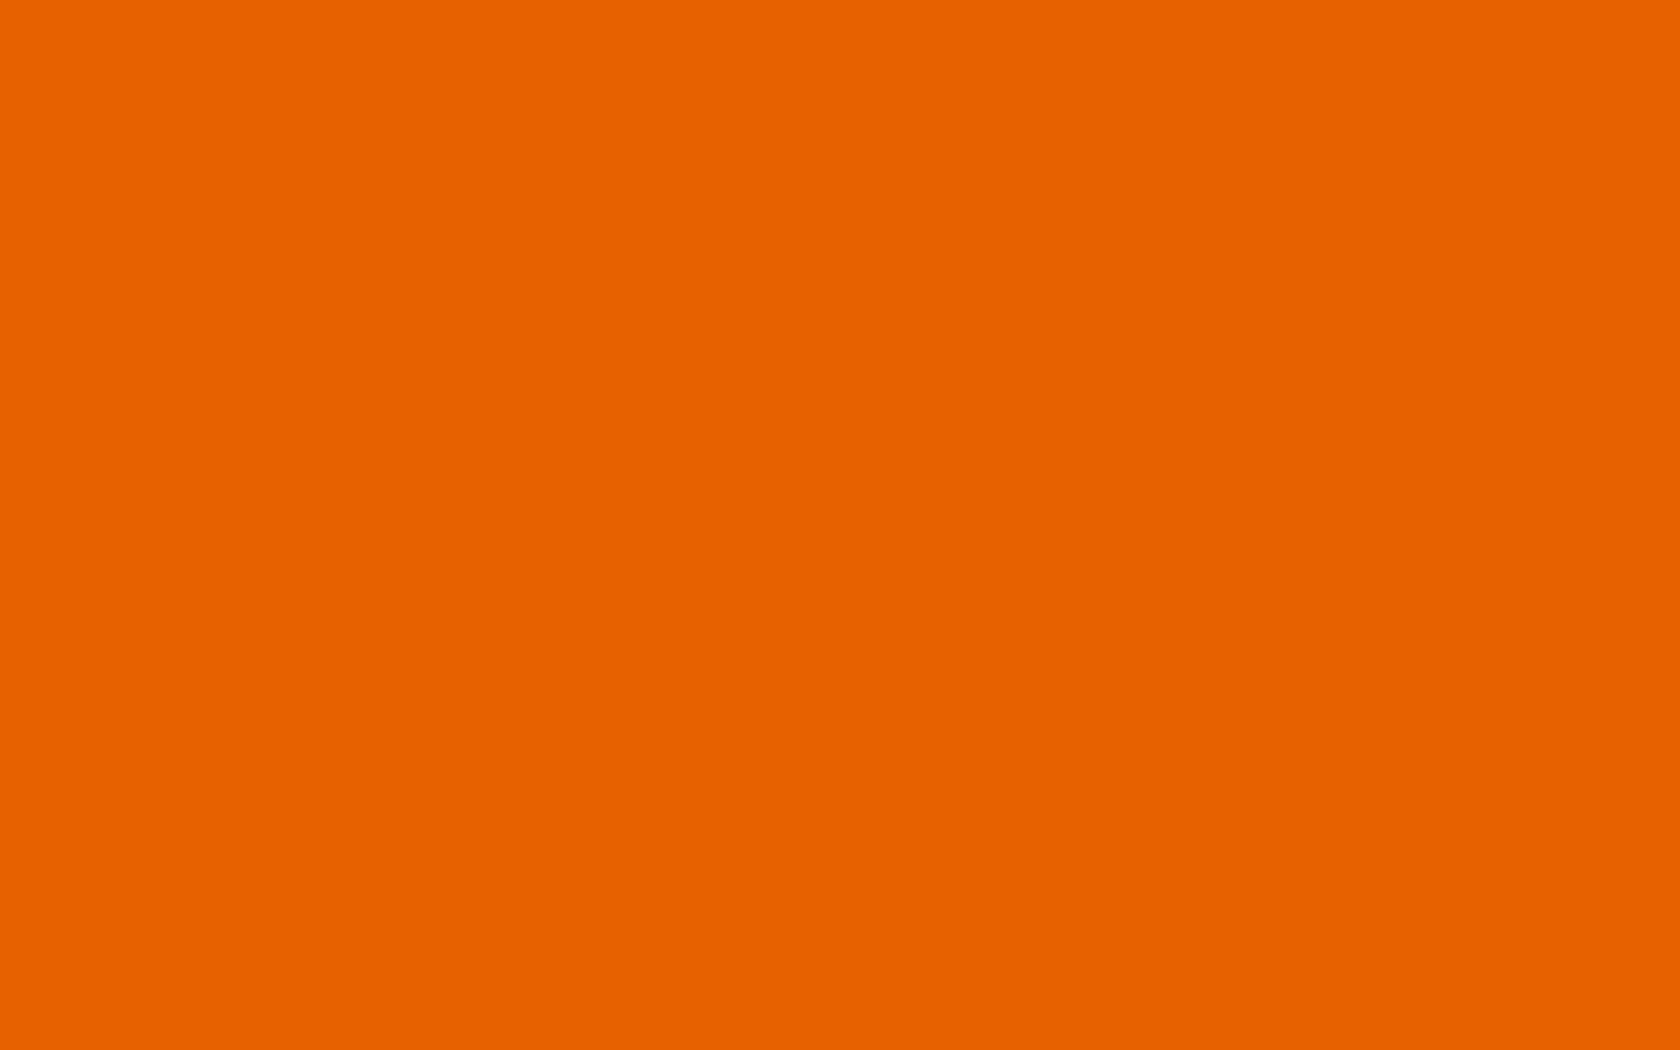 1680x1050 Spanish Orange Solid Color Background